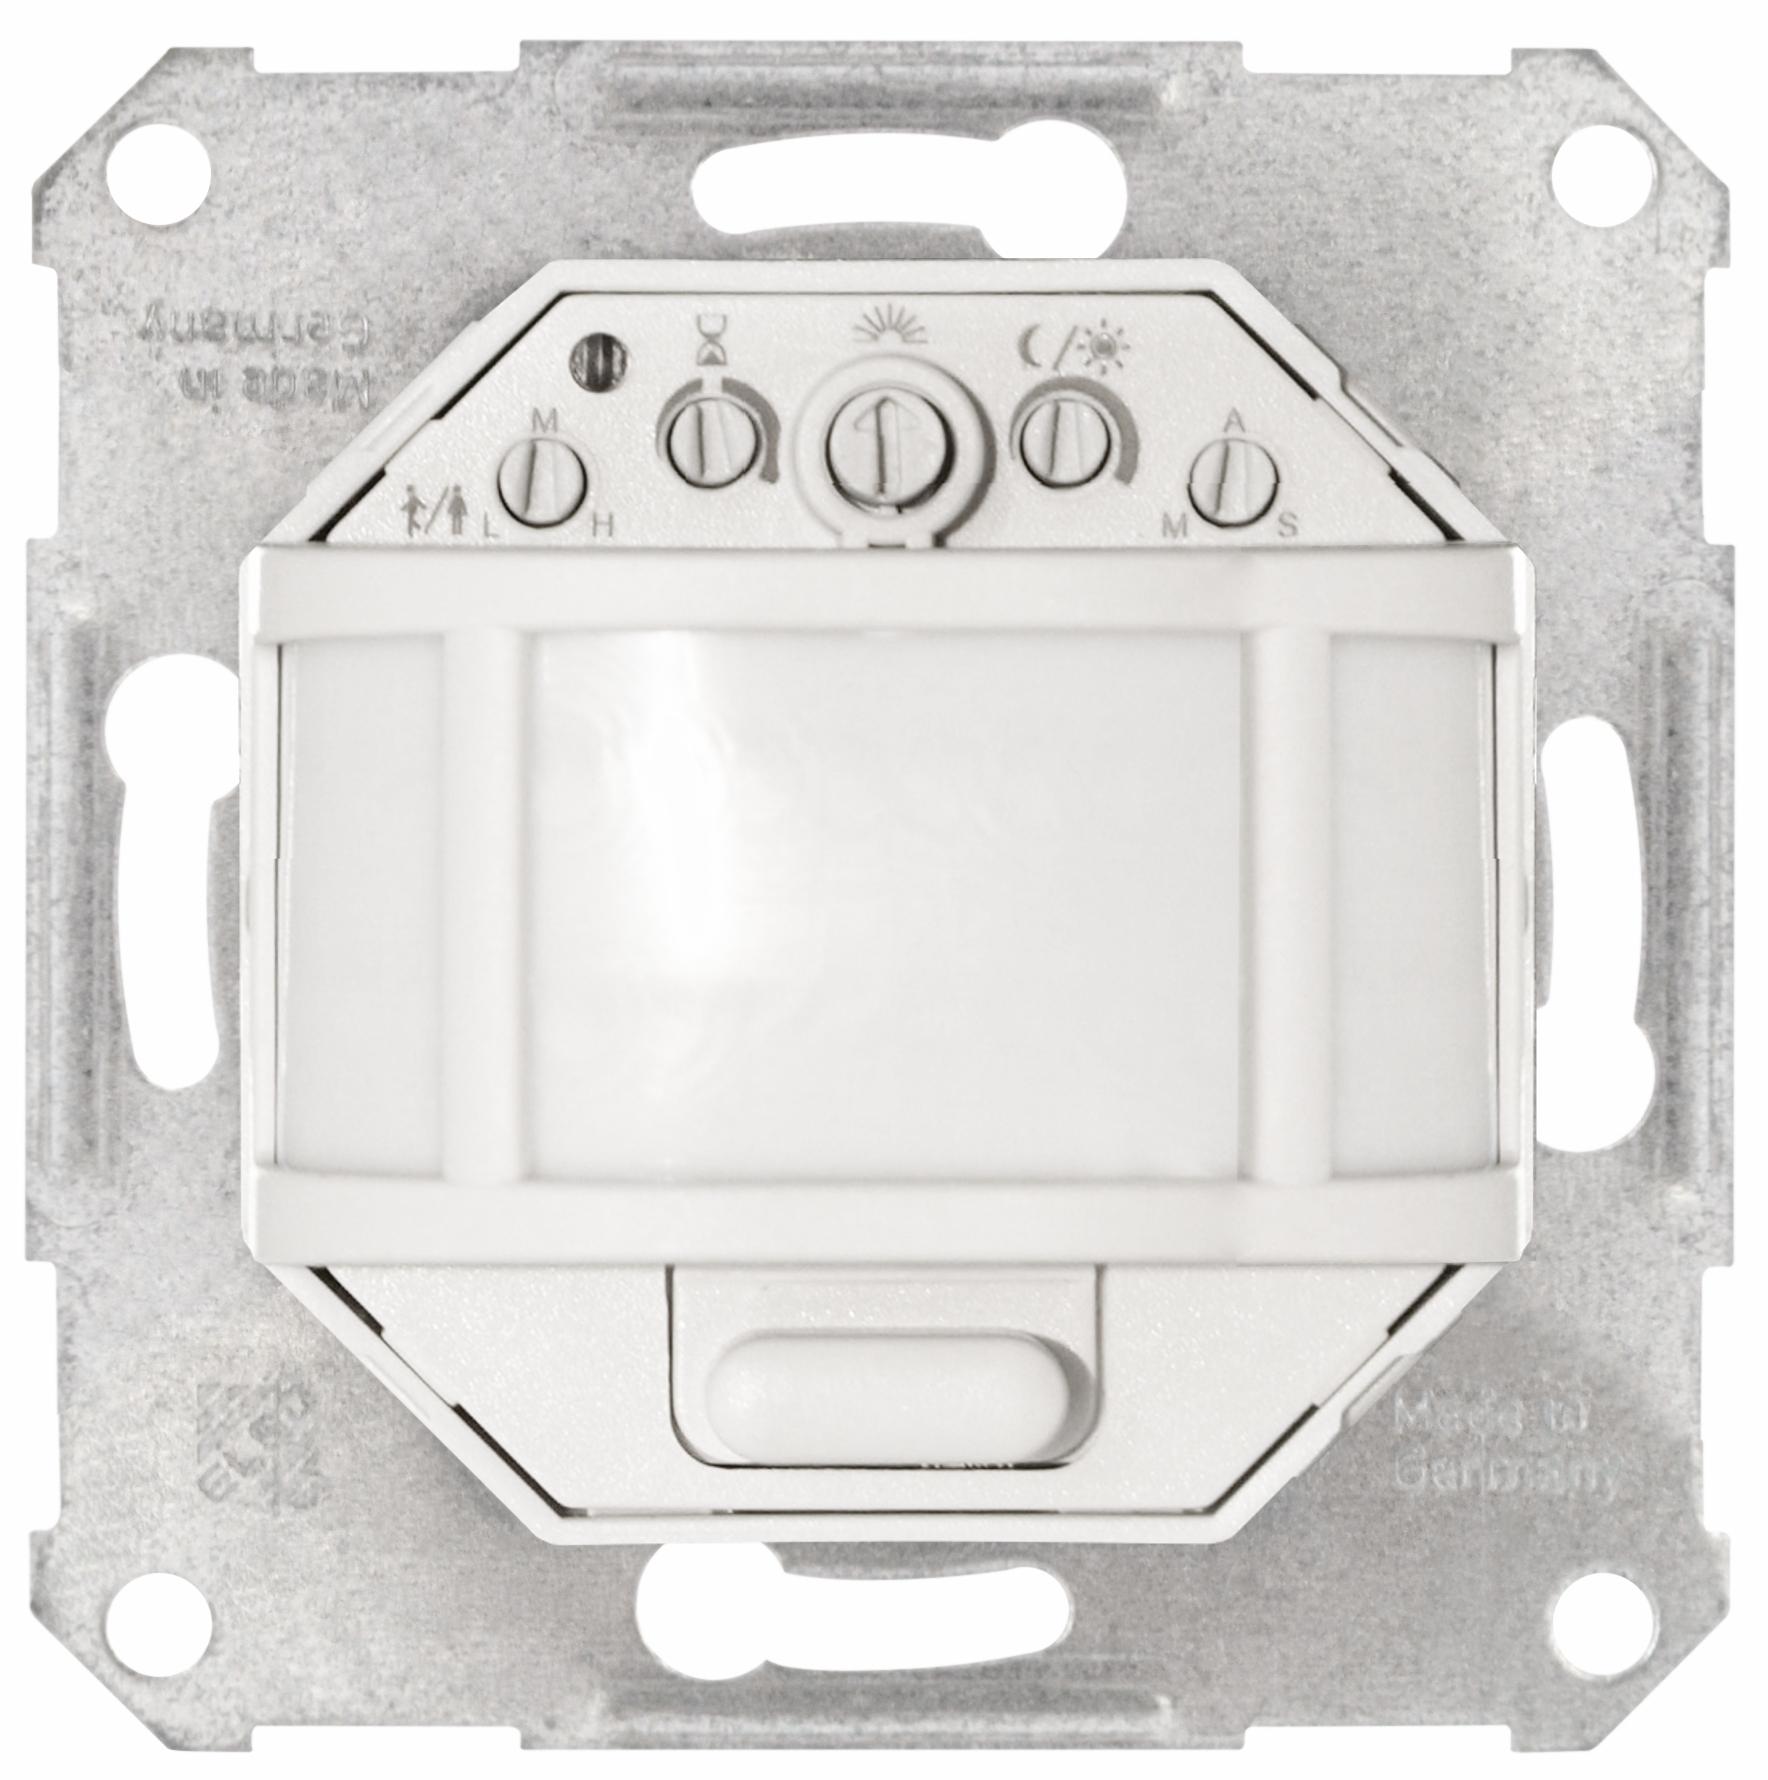 1 Stk Passiv Infrarot Bewegungsmelder bis 2300W (VA) R, L, C EL171130--